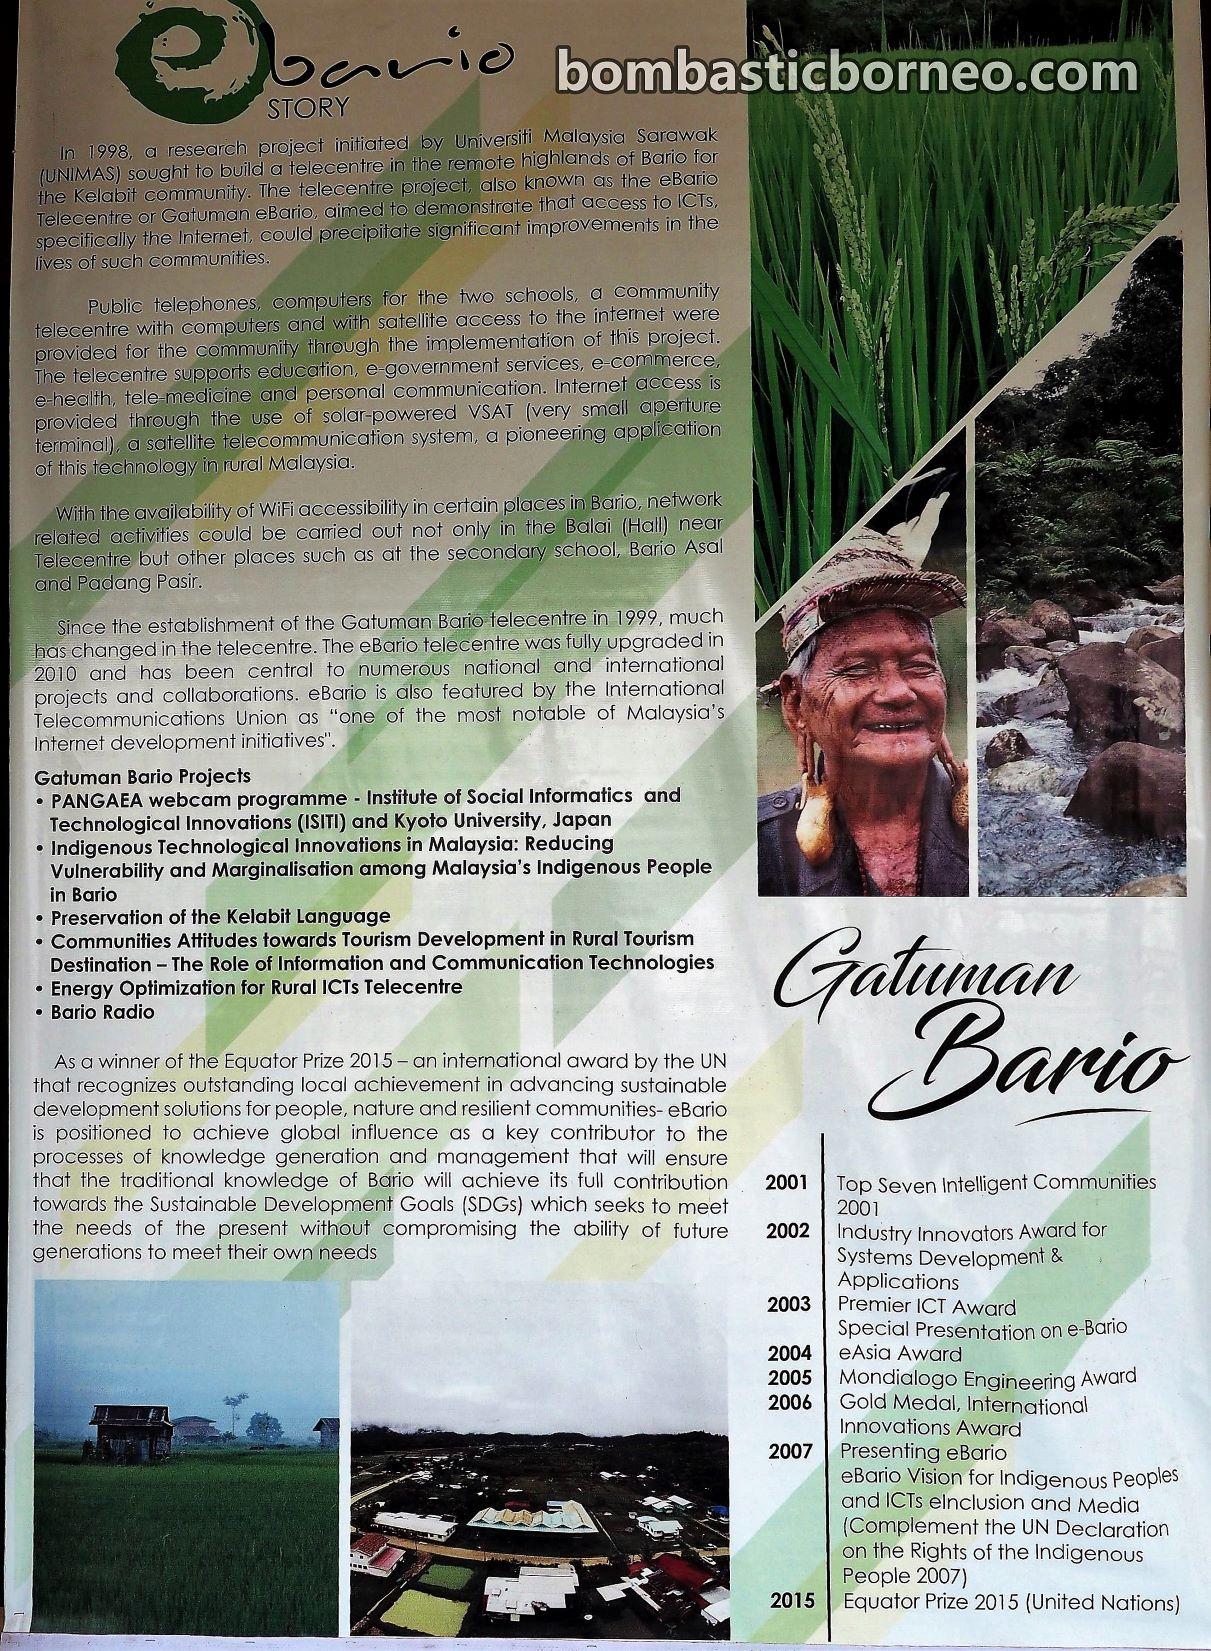 Kelabit Highlands, information. backpackers, destination, exploration, Interior village, dayak, native, tribal, orang ulu, Tourism, Cross Border, 穿越婆罗洲游踪, 砂拉越加拉毕族部落, 巴里奥原住民达雅